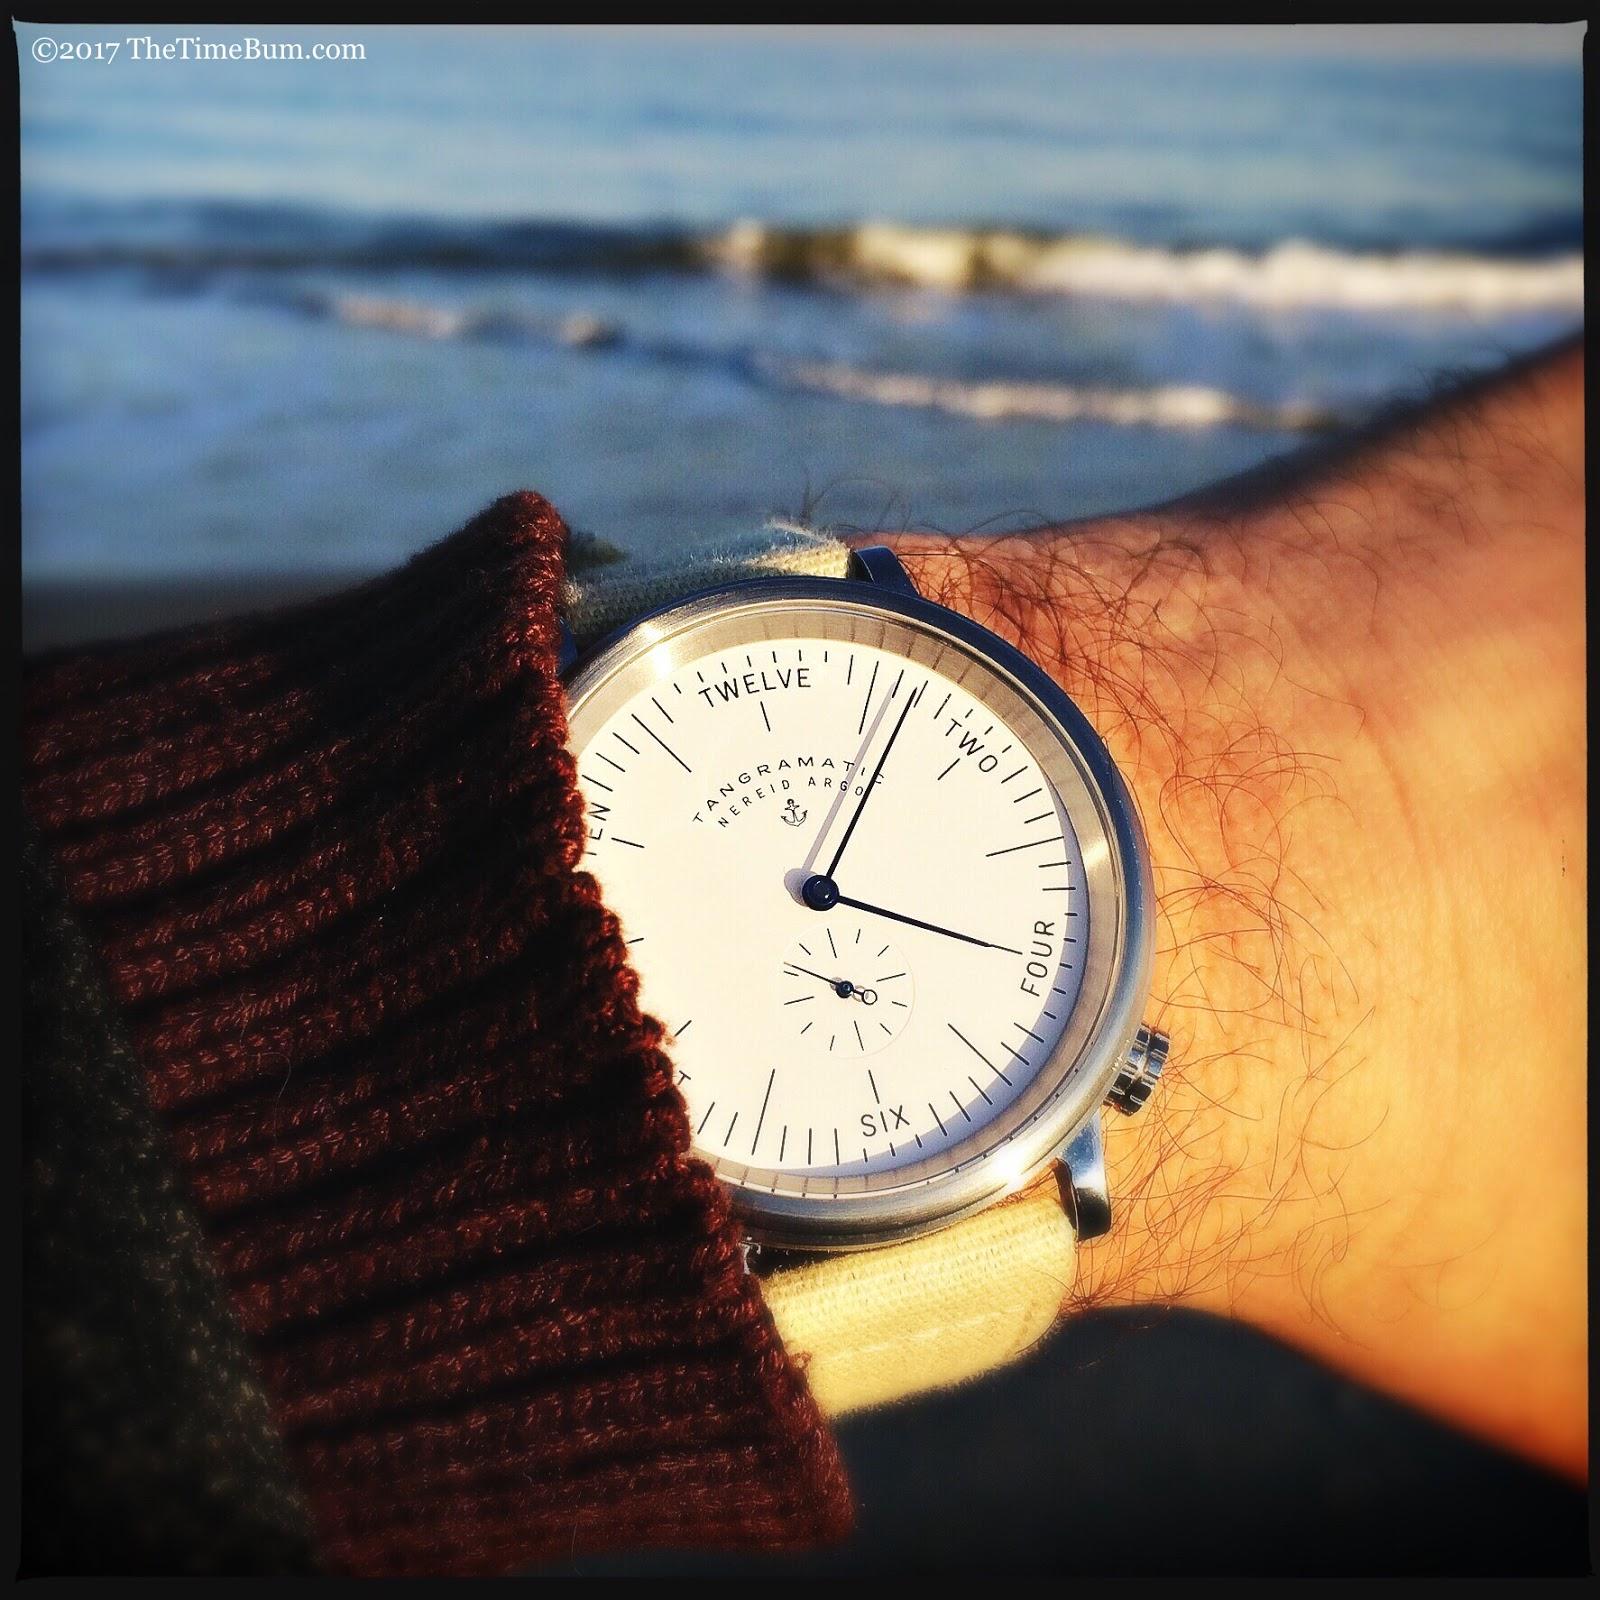 Tangramatic Nereid Argo wrist